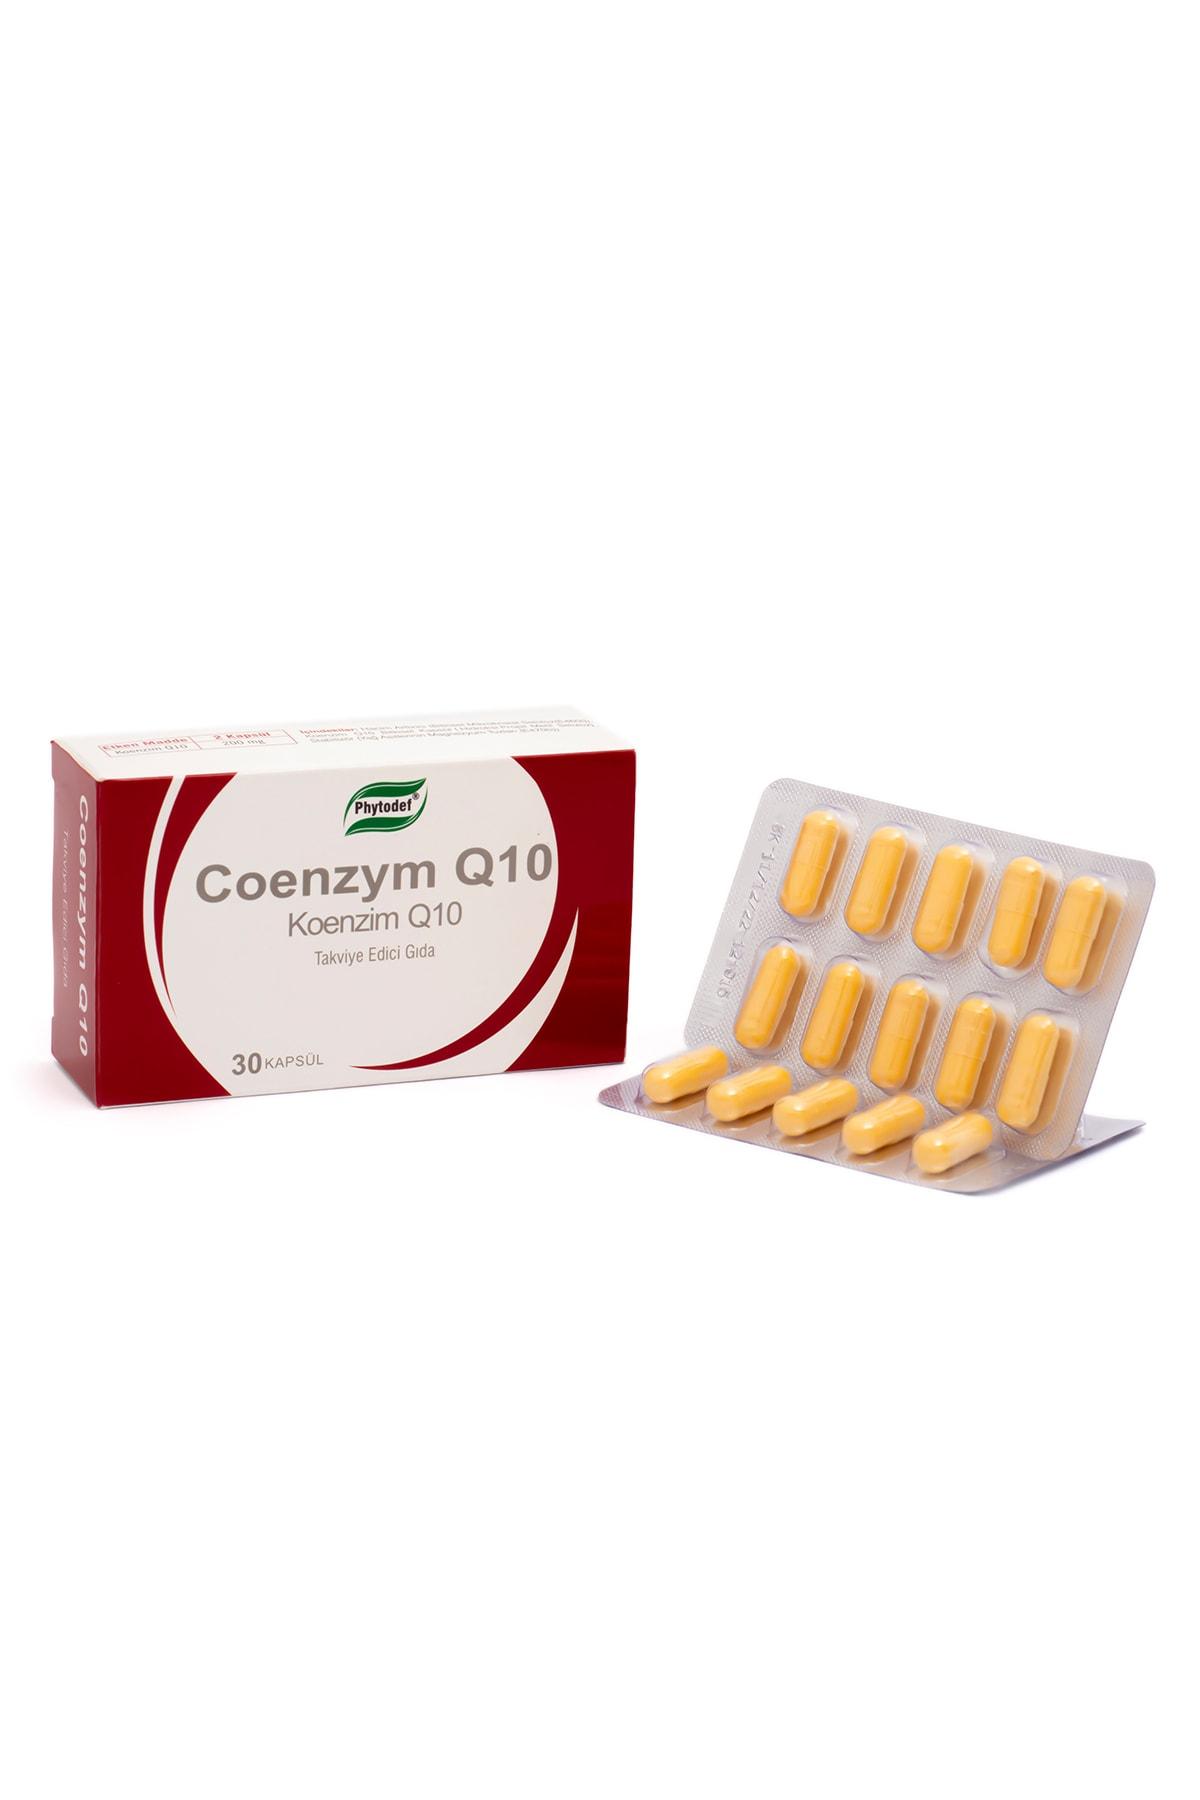 Phytodef Coenzym Q10 - 30 Kapsül 2